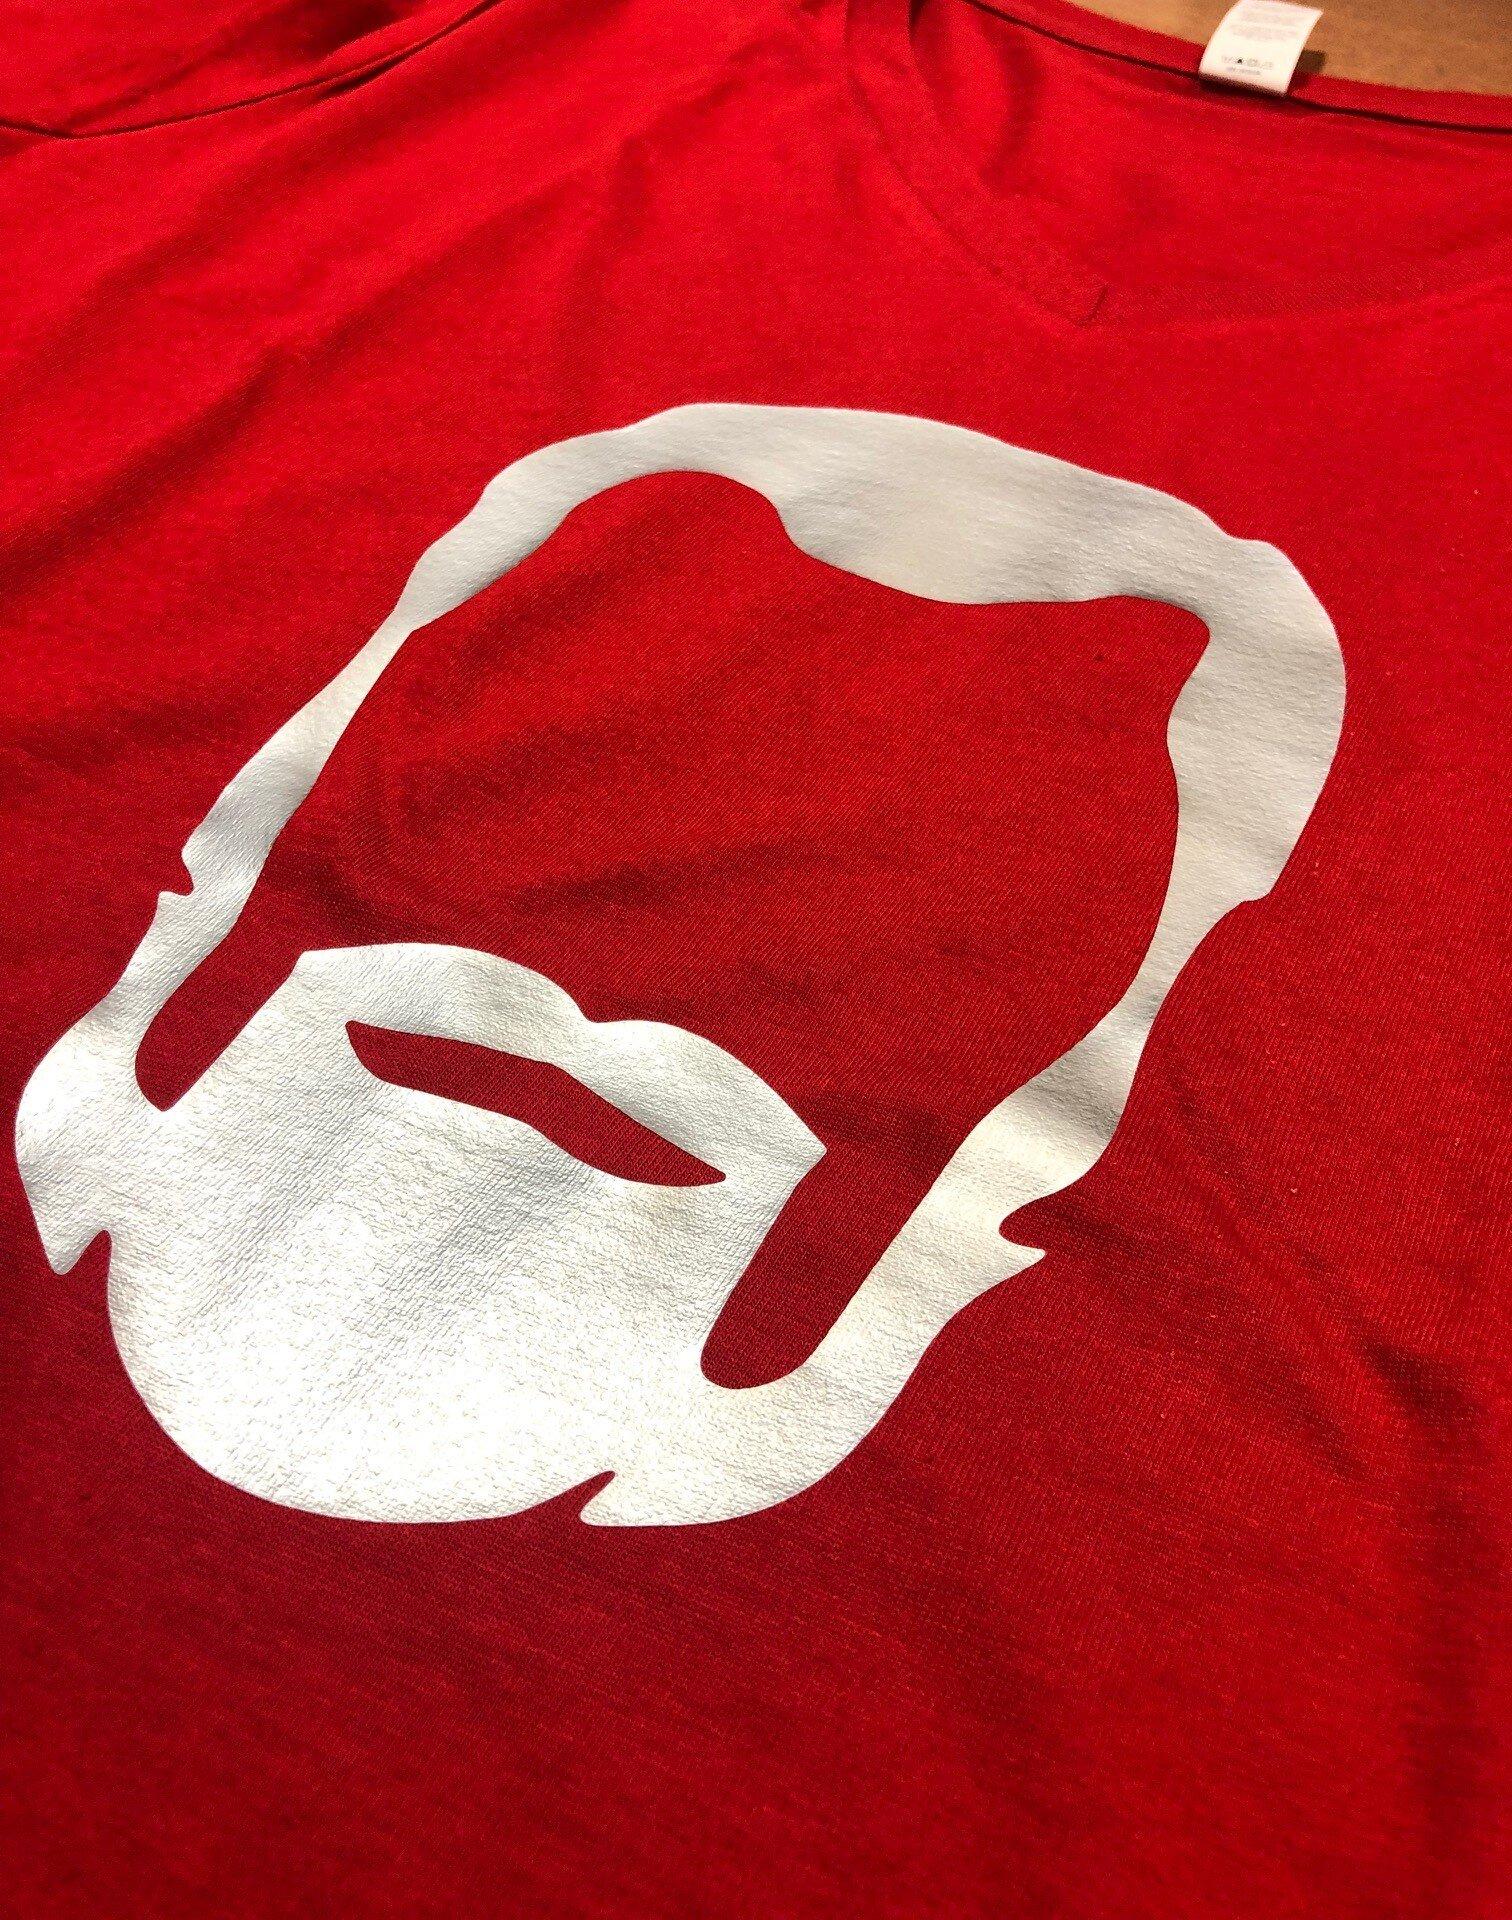 logounltd_laser_etching_embroidery_screen_printing_apparel_uniform_custom_tshirts_t_shirt_kirkland_bellevue_seattle_redmond_woodinville_branded_merchandise_promotional_products_logo_unltd (11).jpg